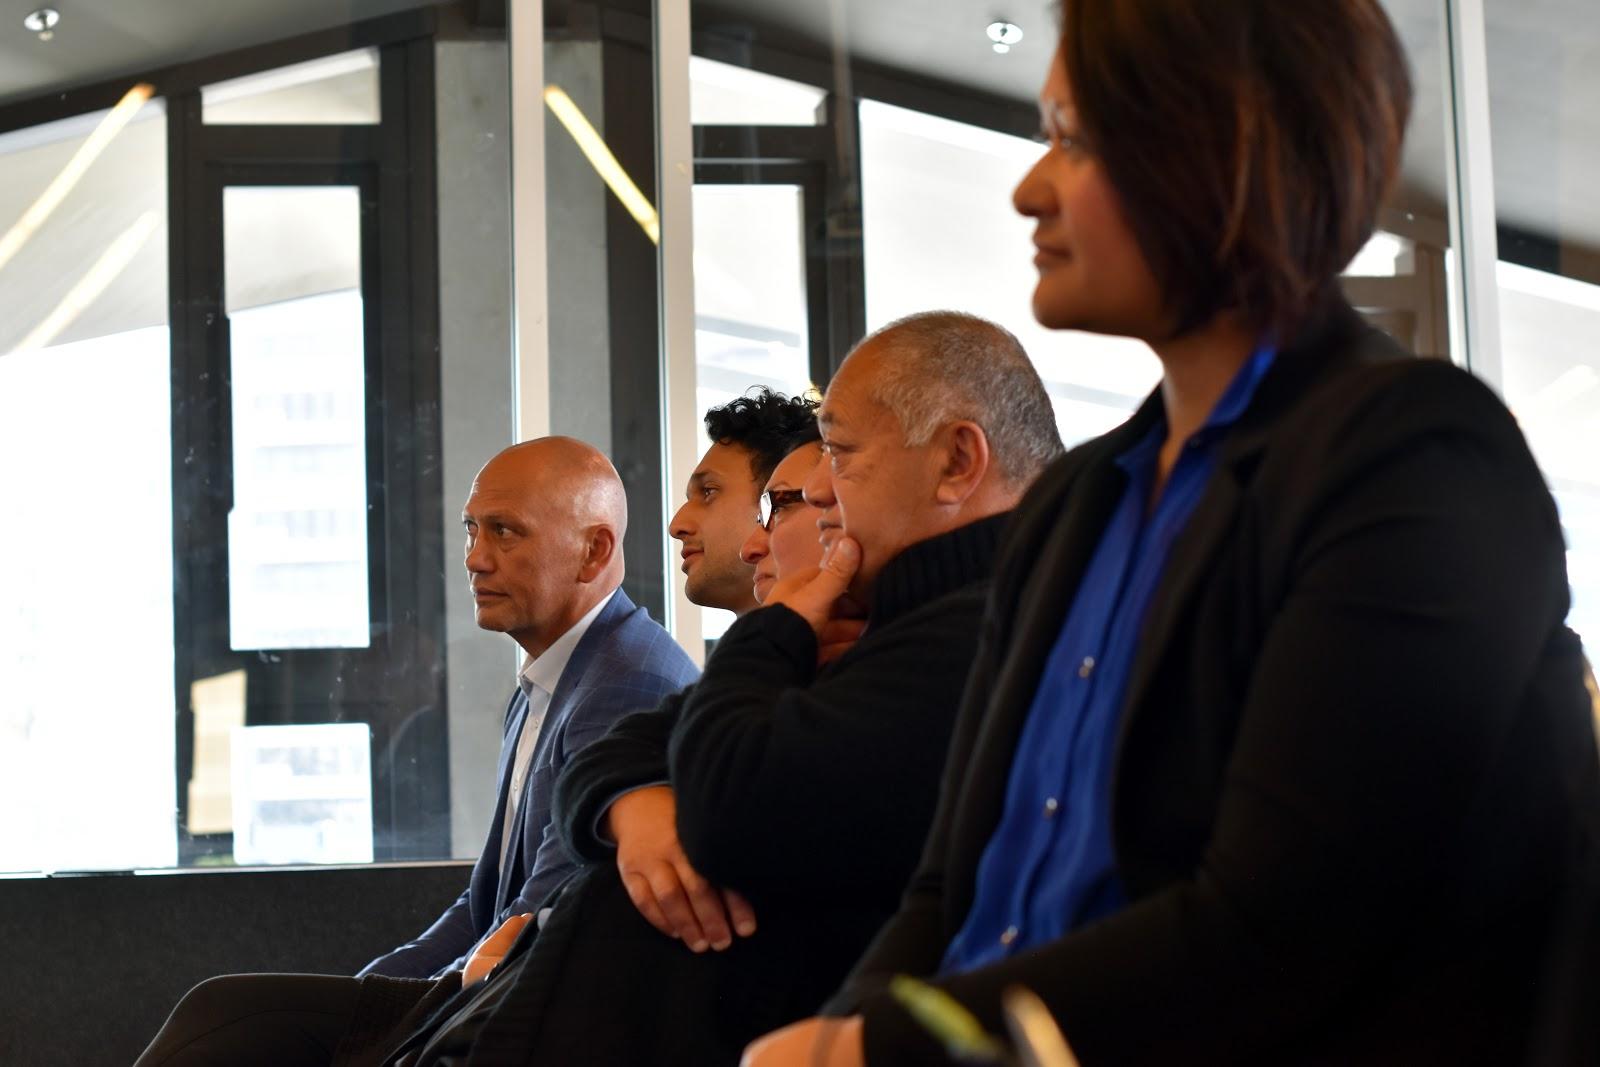 Spirituality for young Māori was evolving